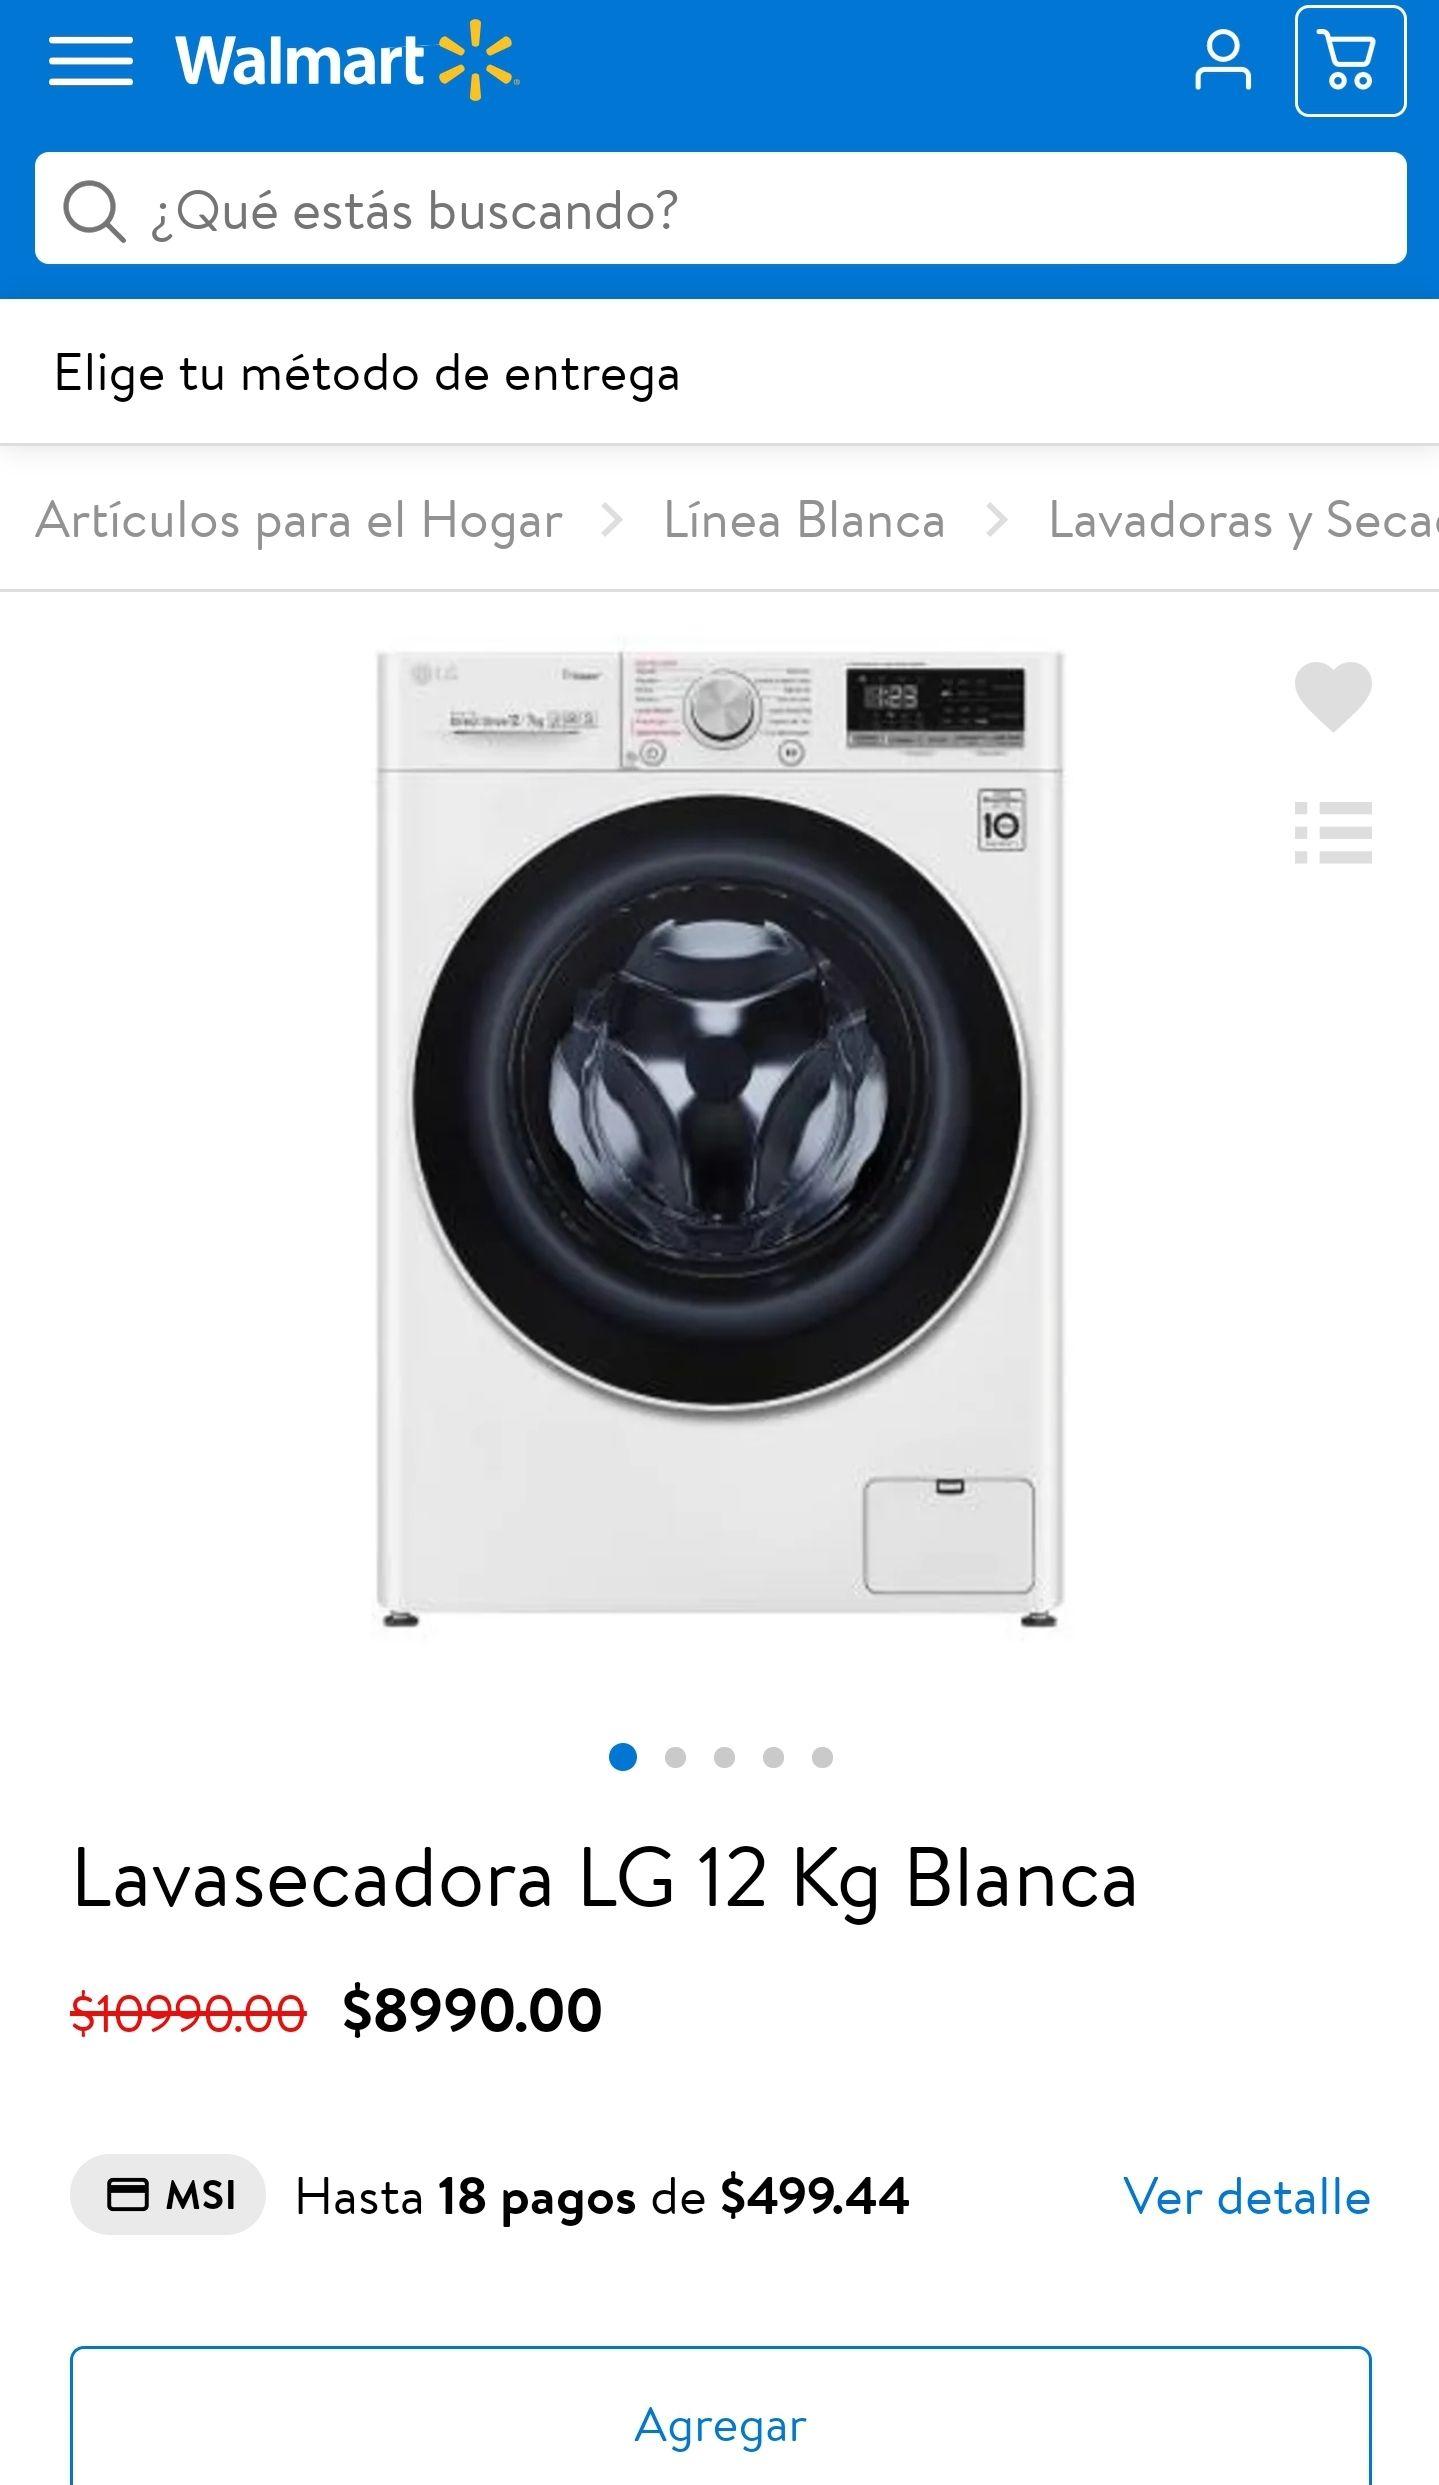 Walmart: Lavasecadora LG 12 Kg Blanca